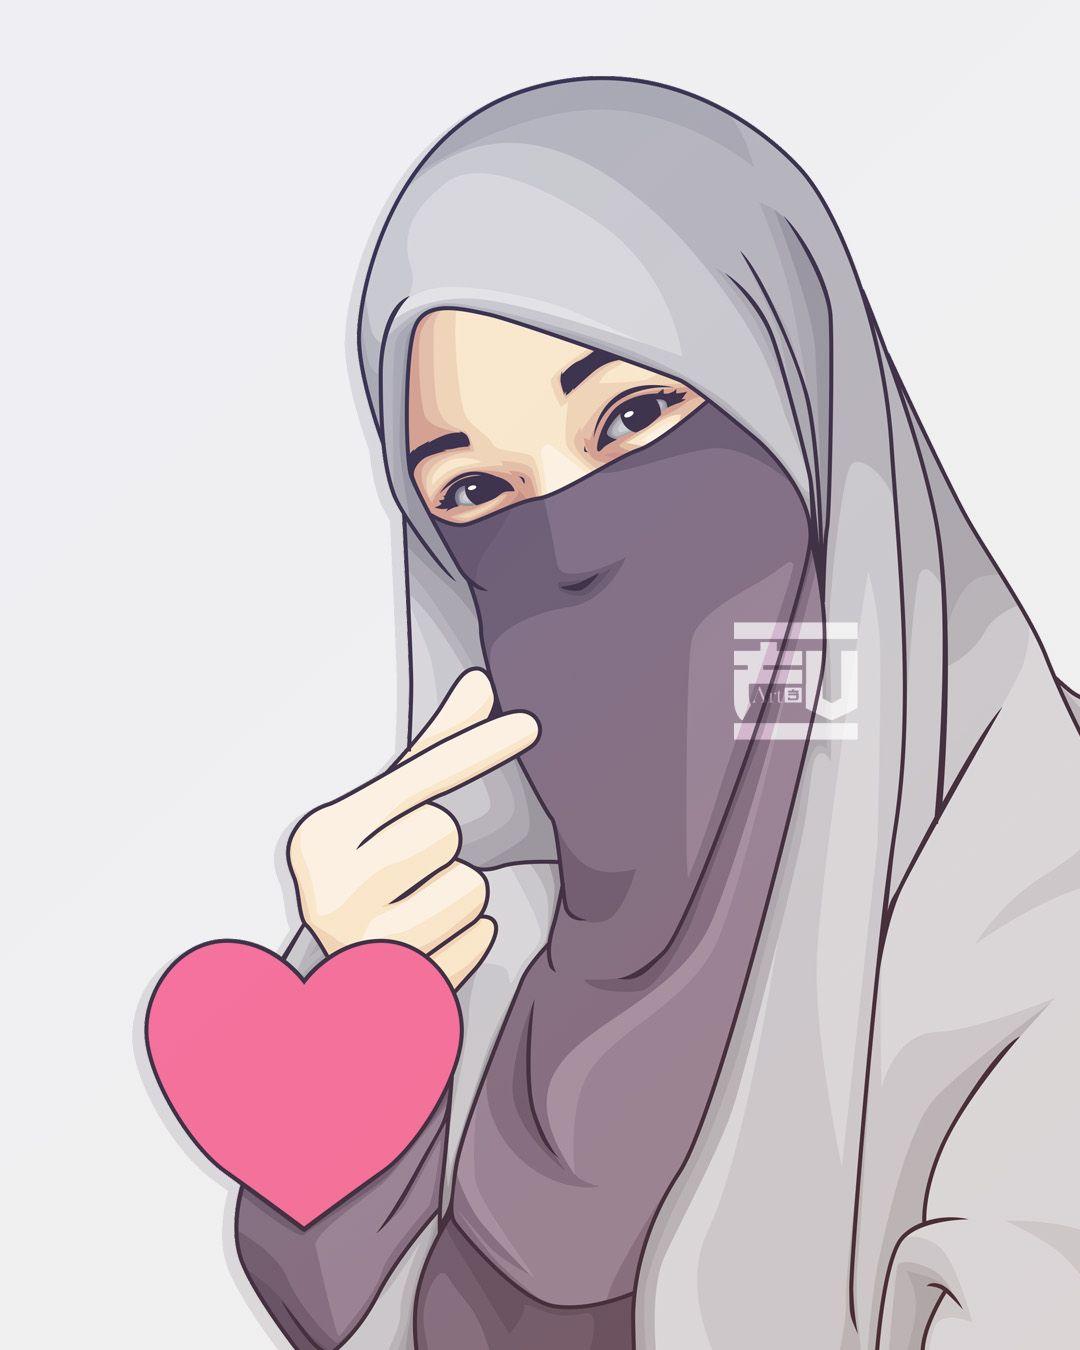 Kartun Muslimah Foto Profil Wa Couple Terpisah Pacar Novocom Top